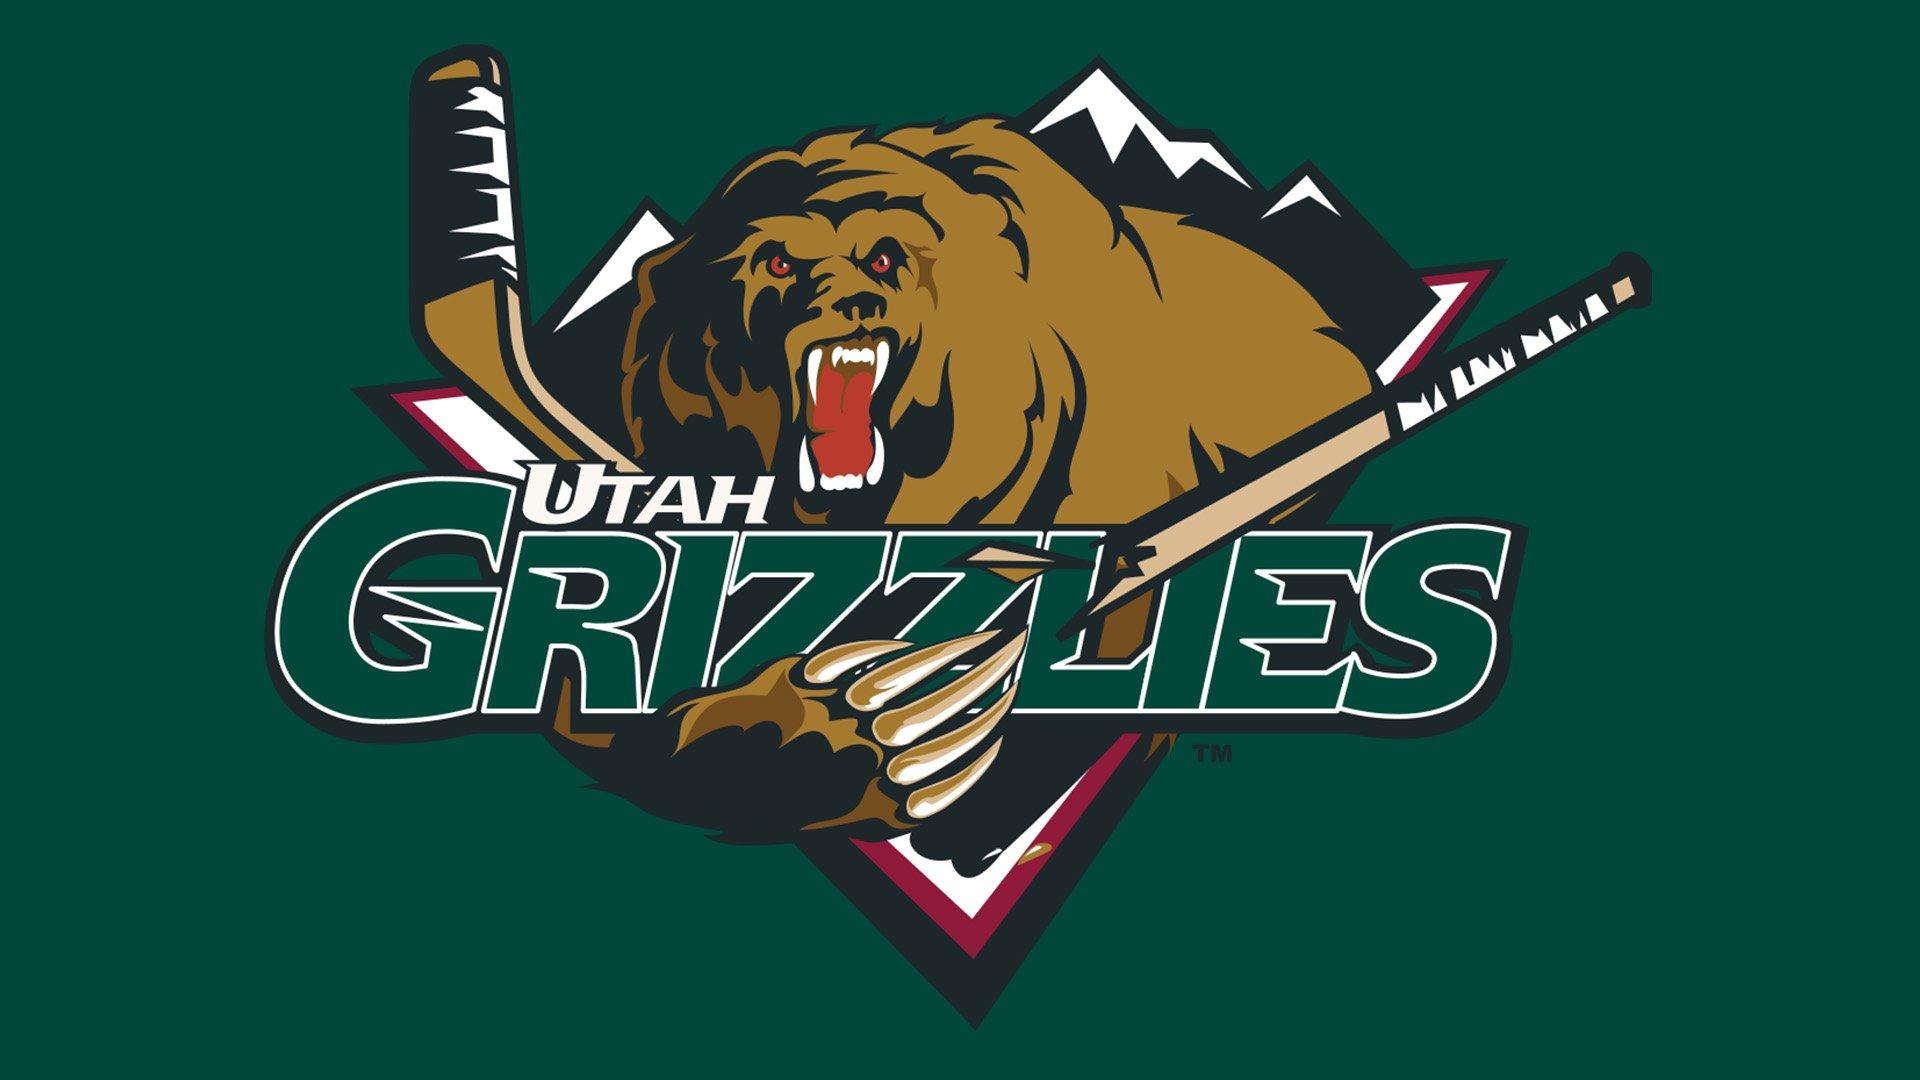 utah grizzlies logo, utah grizzlies symbol, meaning, history and